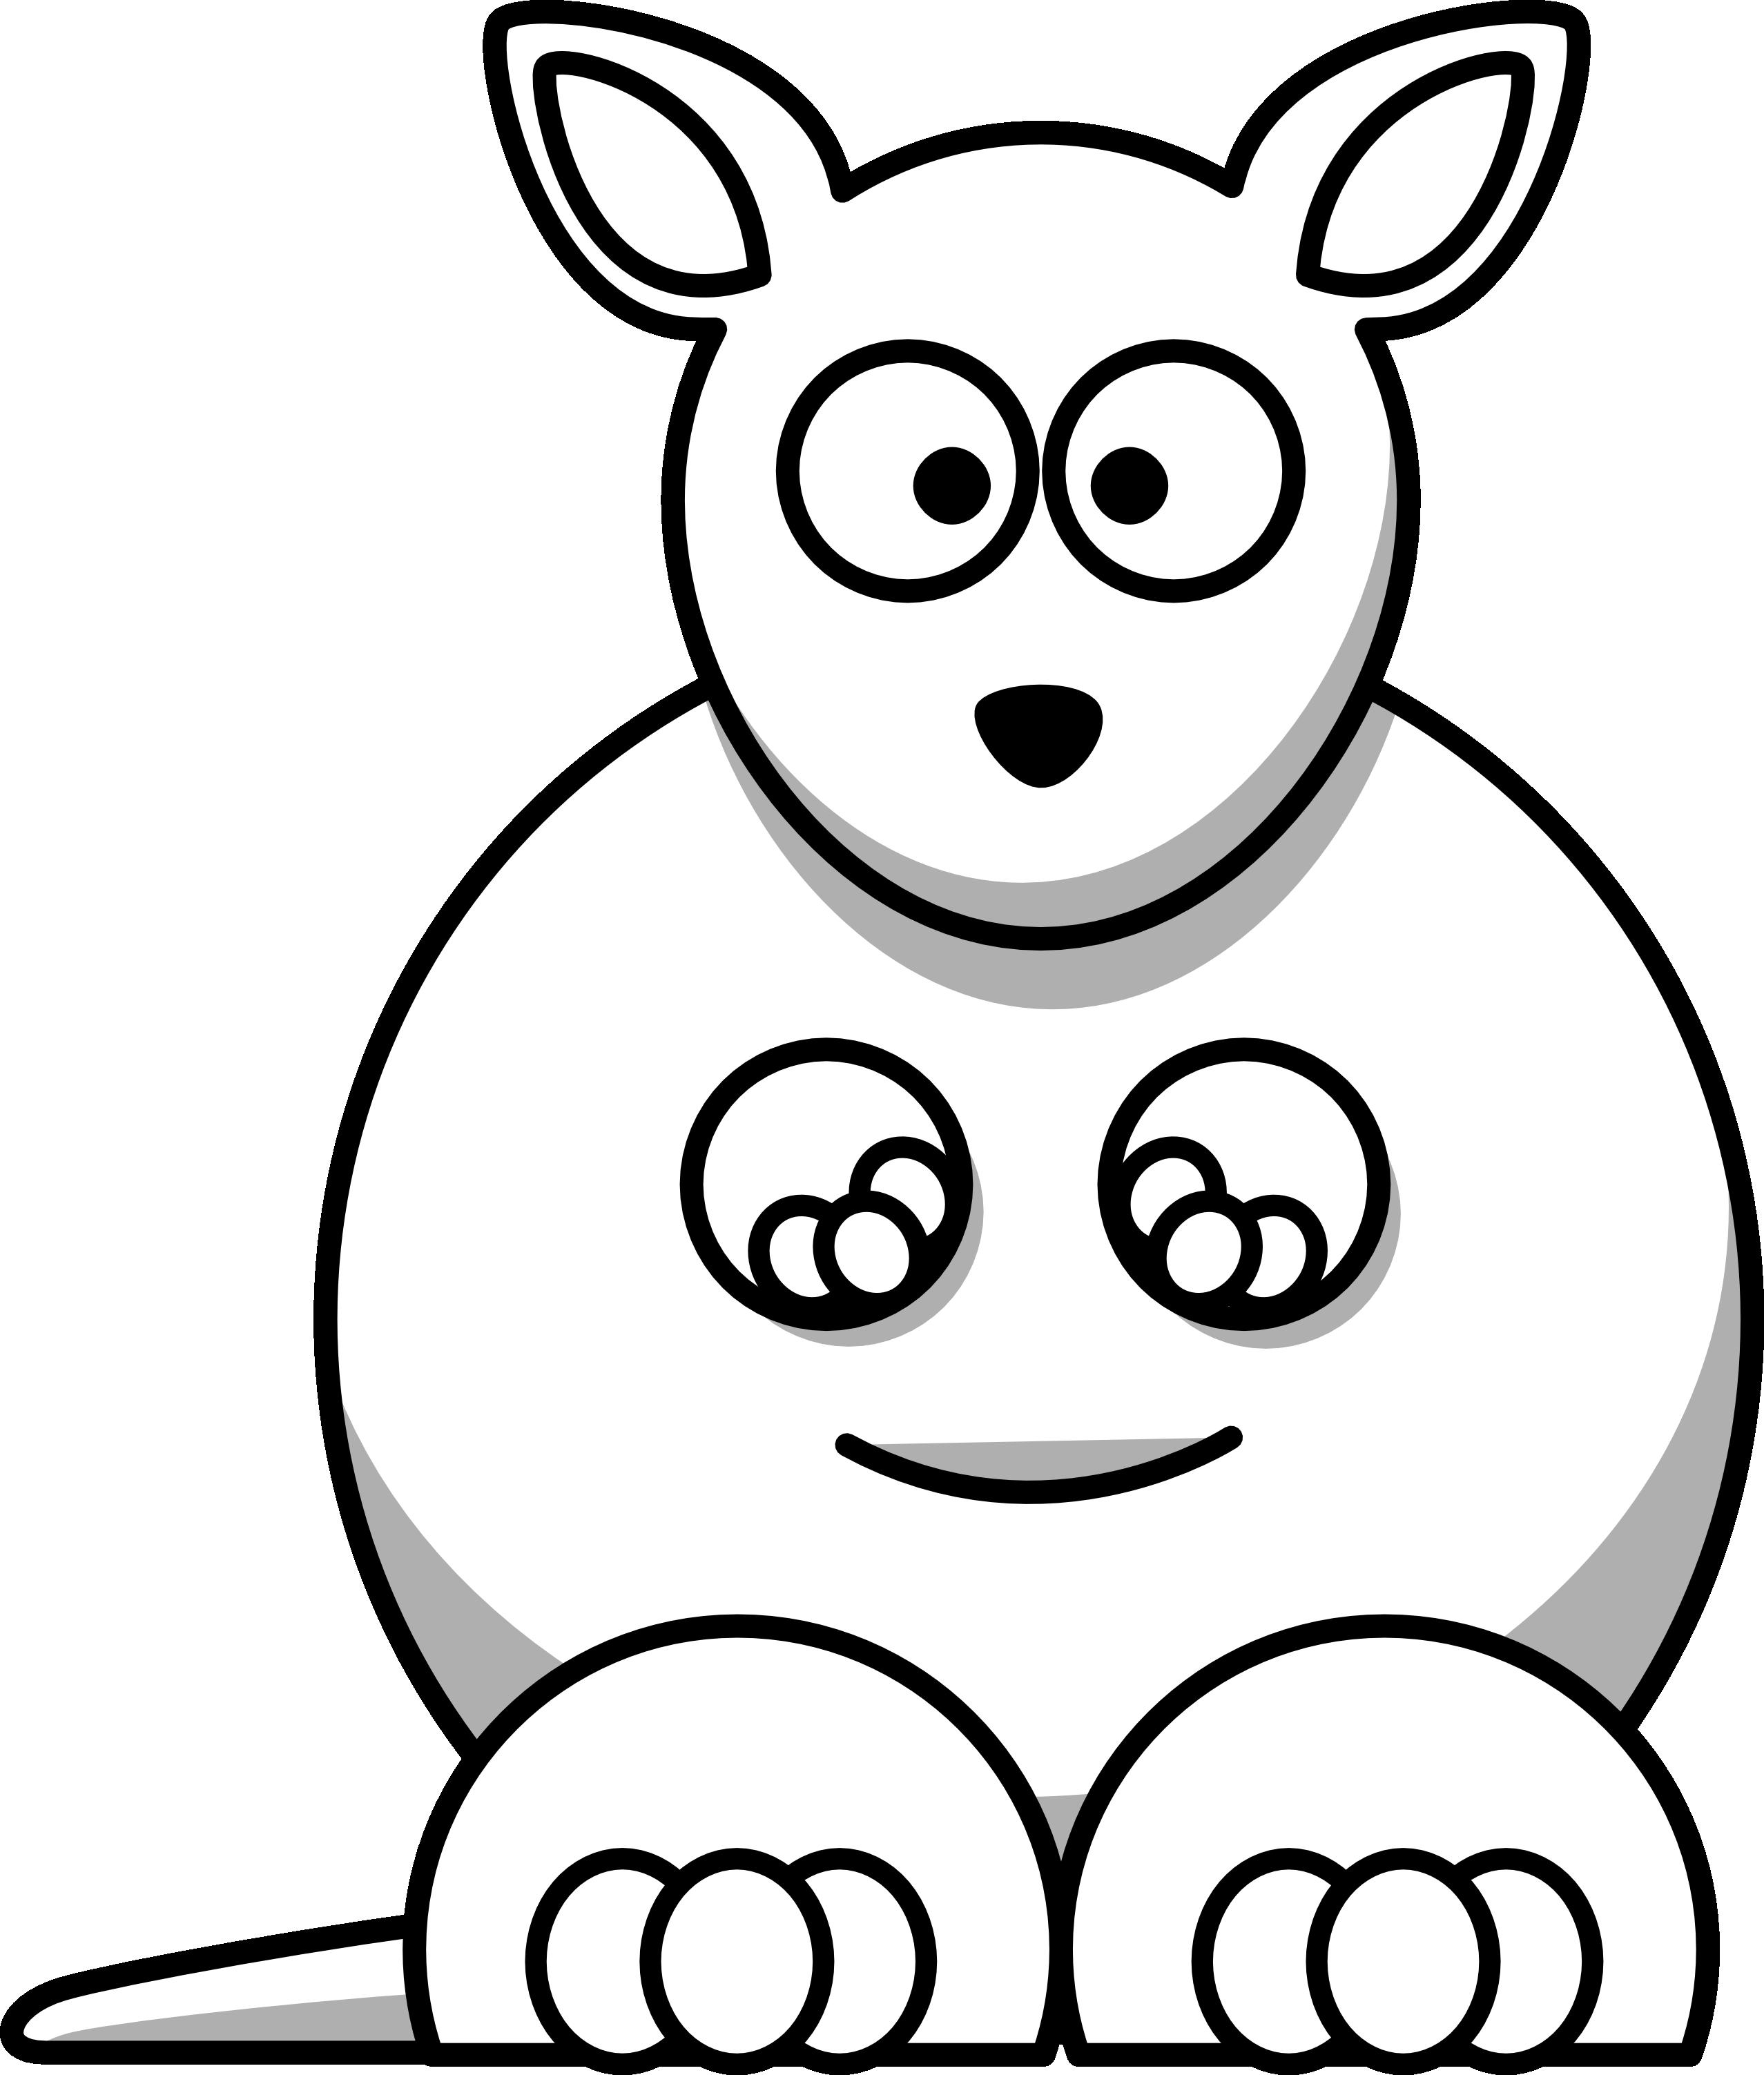 Iphone clipart coloring book. Simple kangaroo face drawing